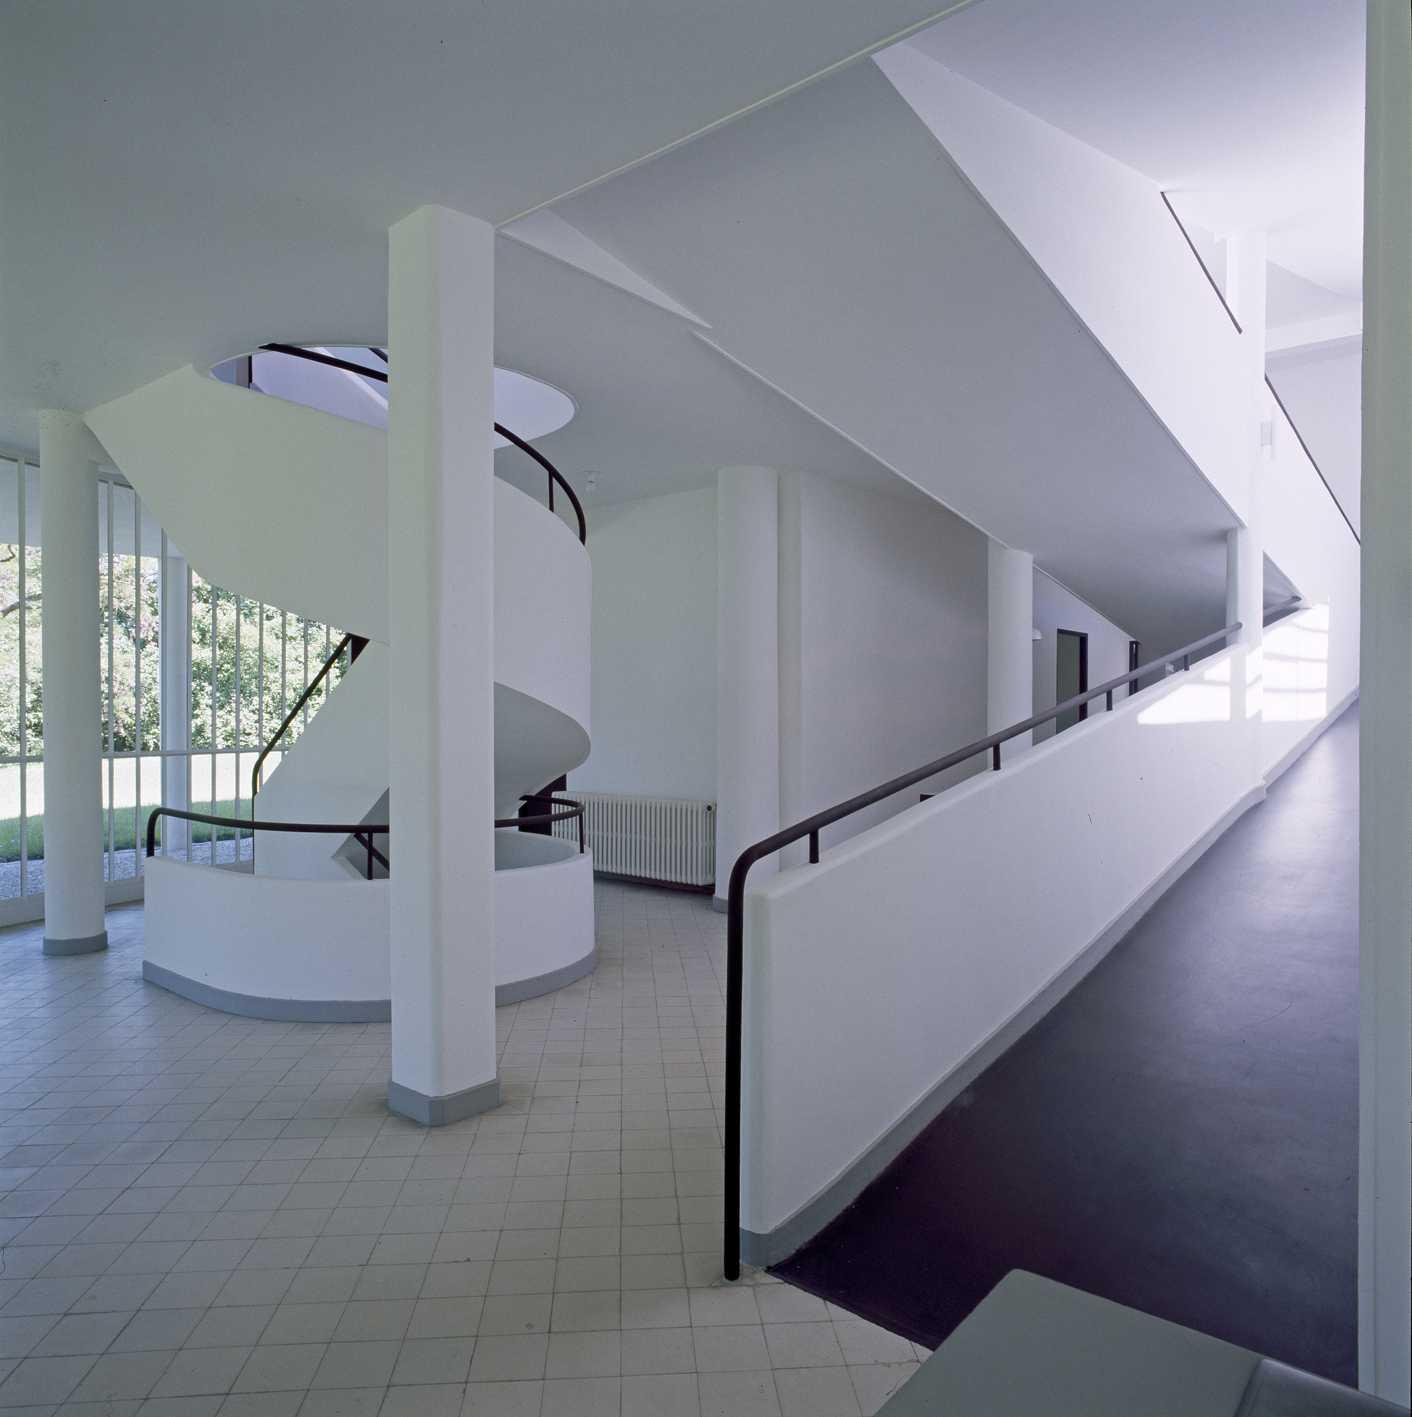 Savoye@J-C. Ballot, CMN Paris (Oeuvre de la Corbusier-Adagp)